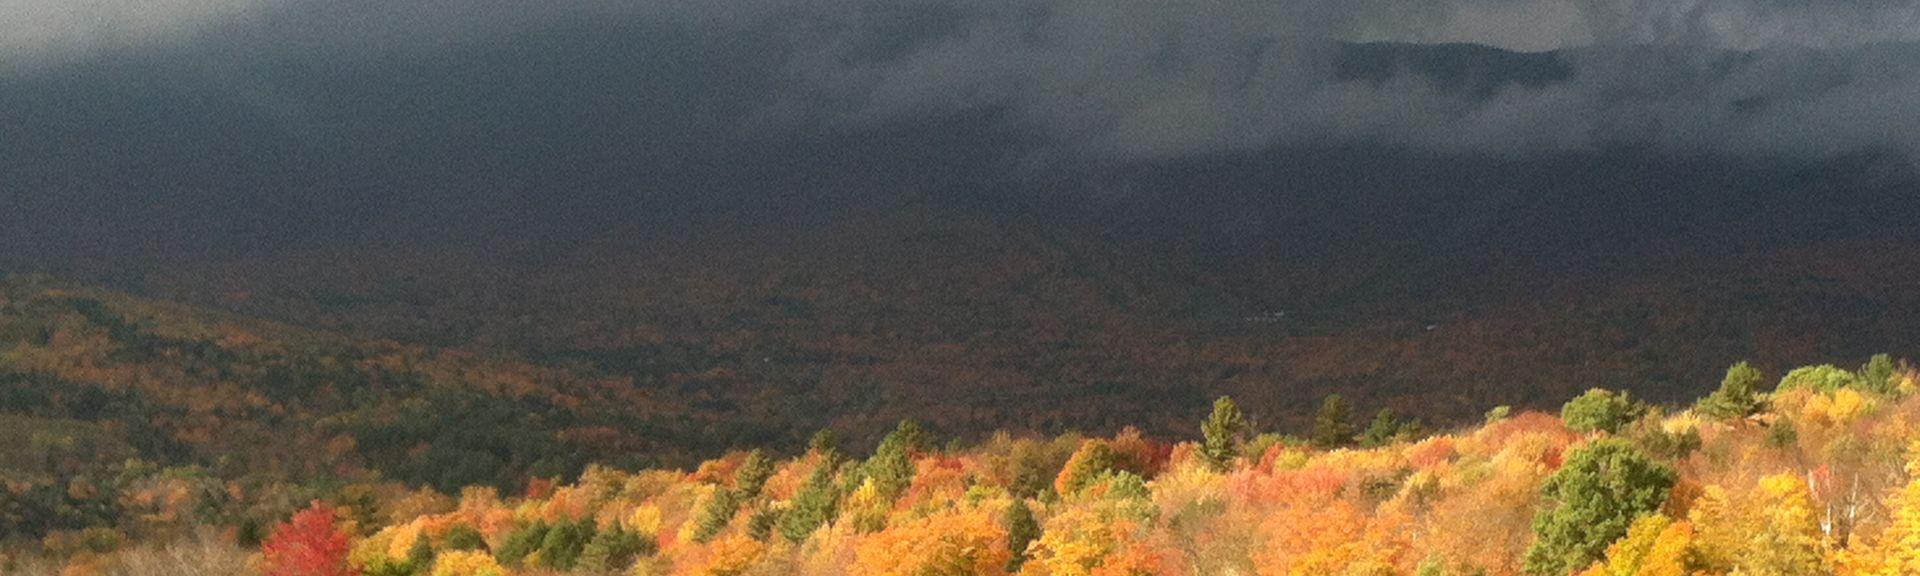 Moretown, Vermont, Estados Unidos